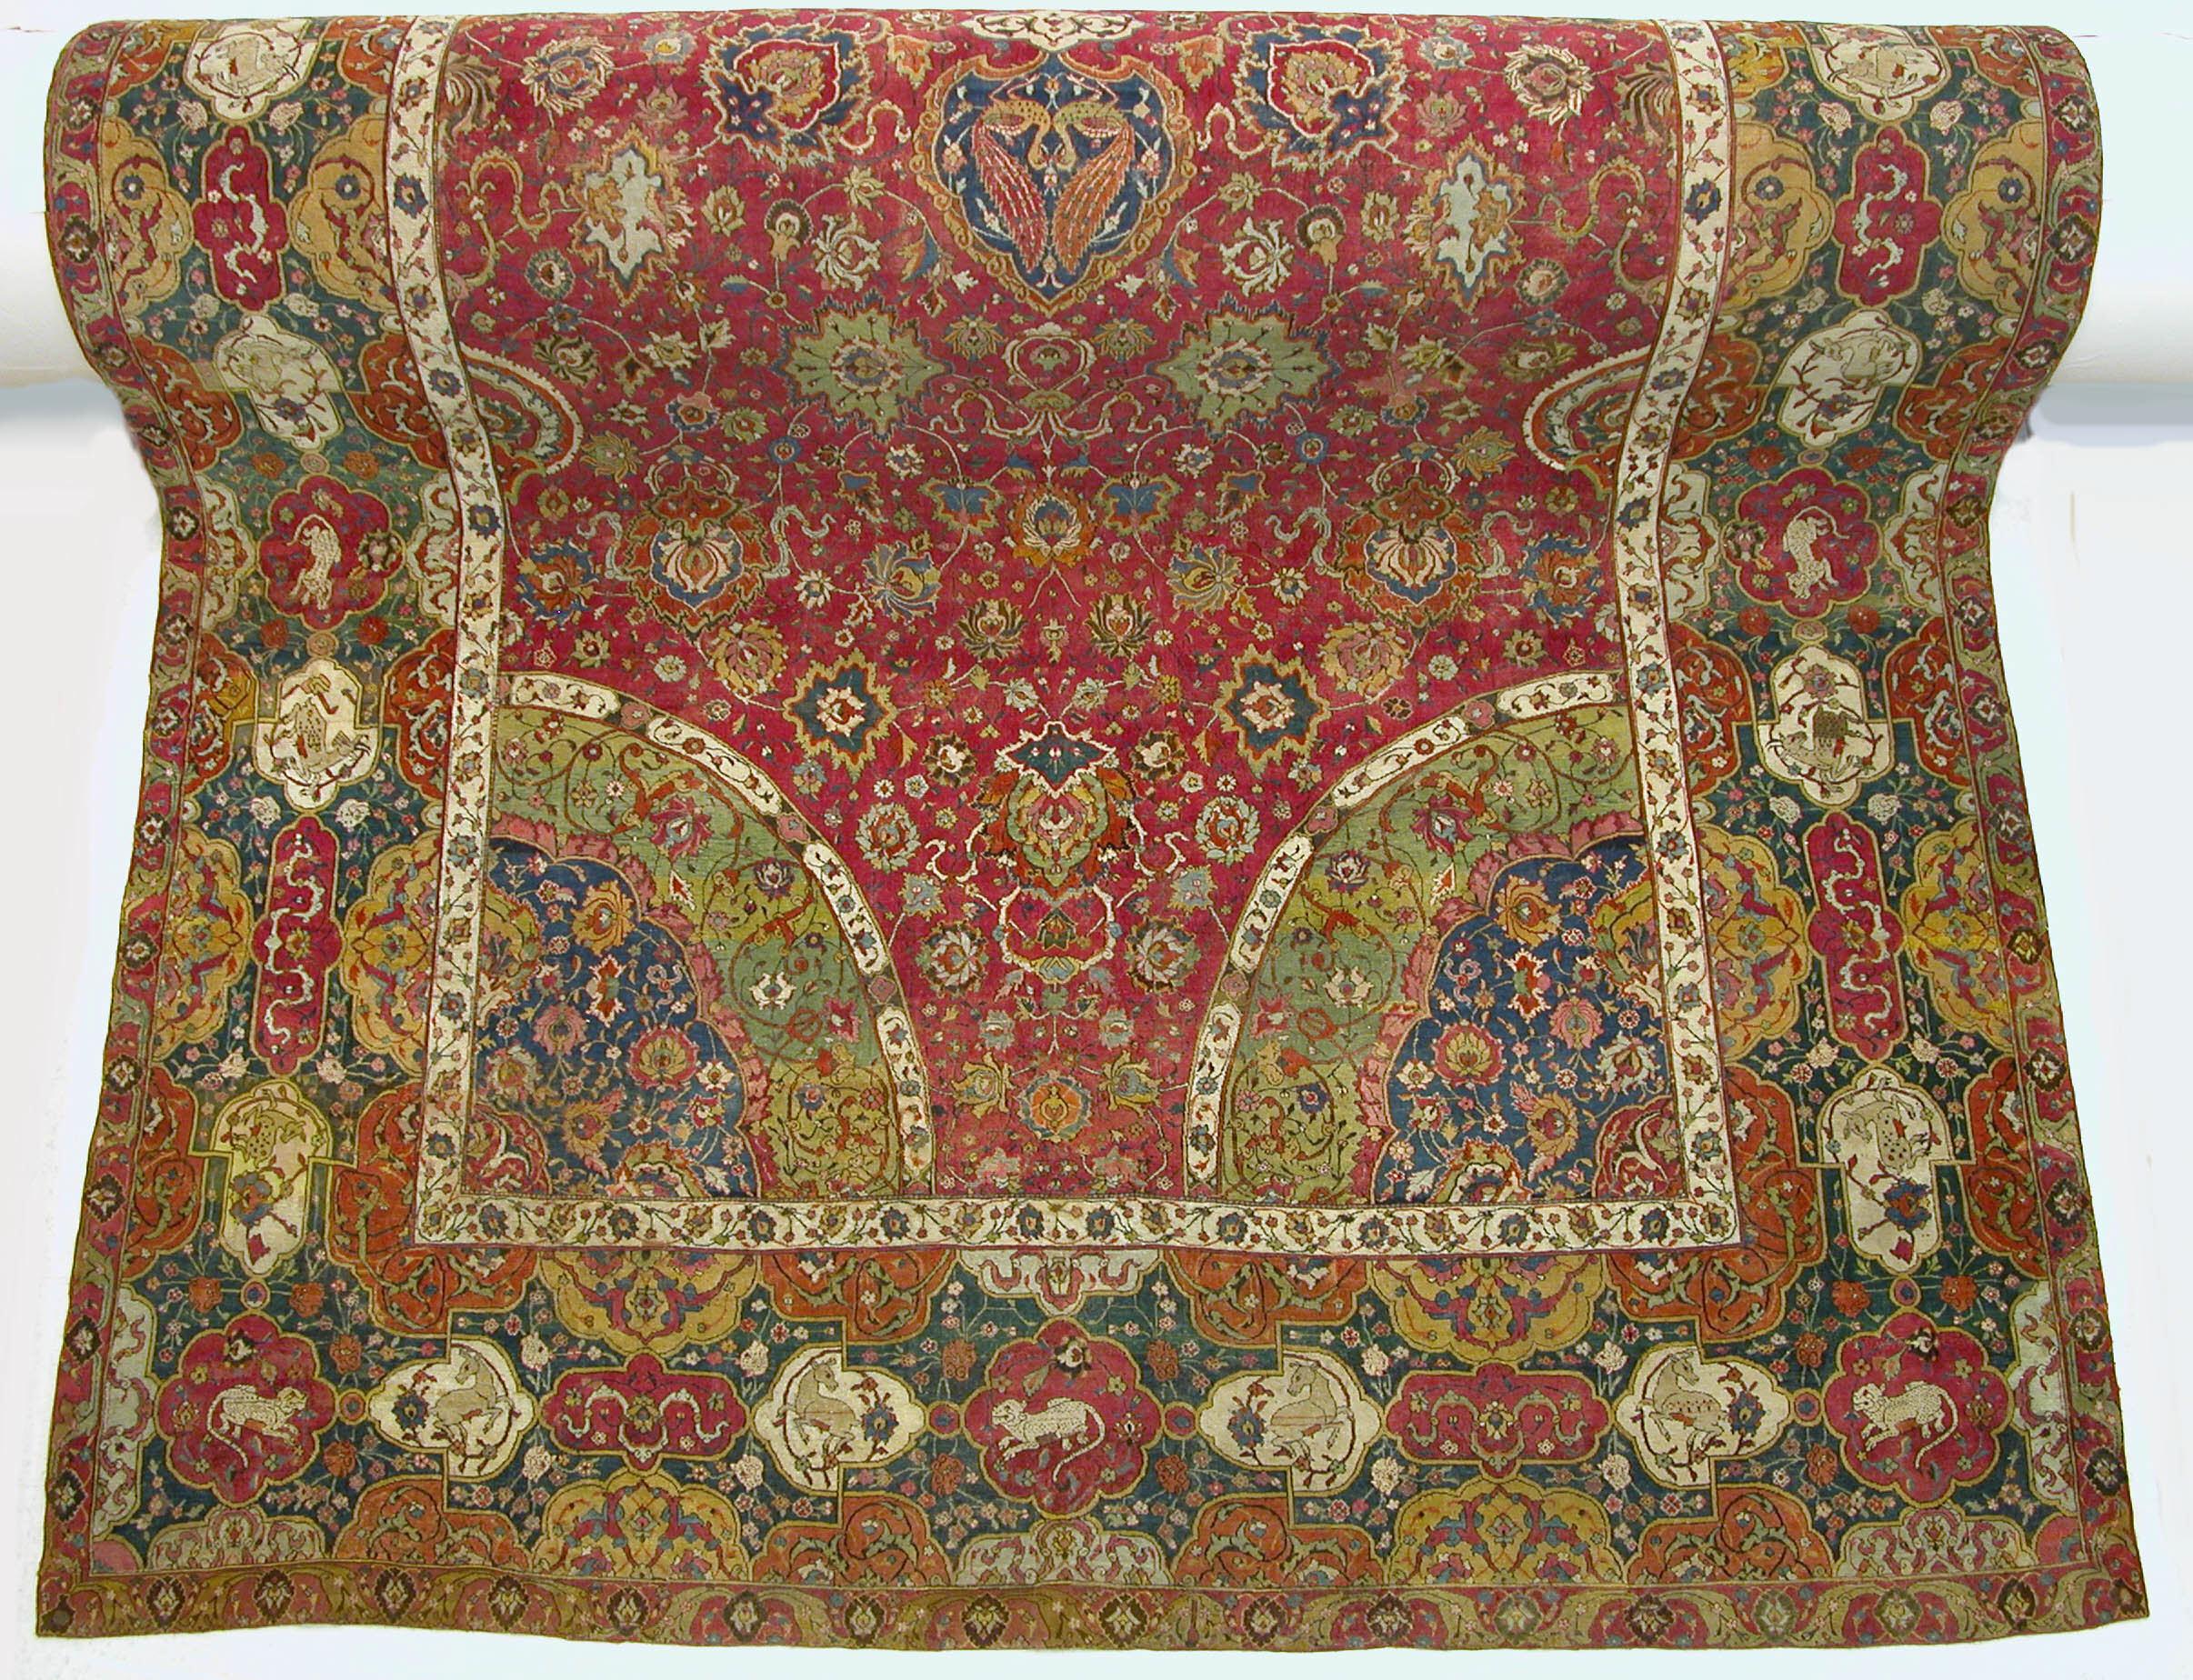 Islamic art: Seley Carpet, late 16th century, silk, cotton, wool, The Metropolitan Museum of Art, New York, NY, USA.